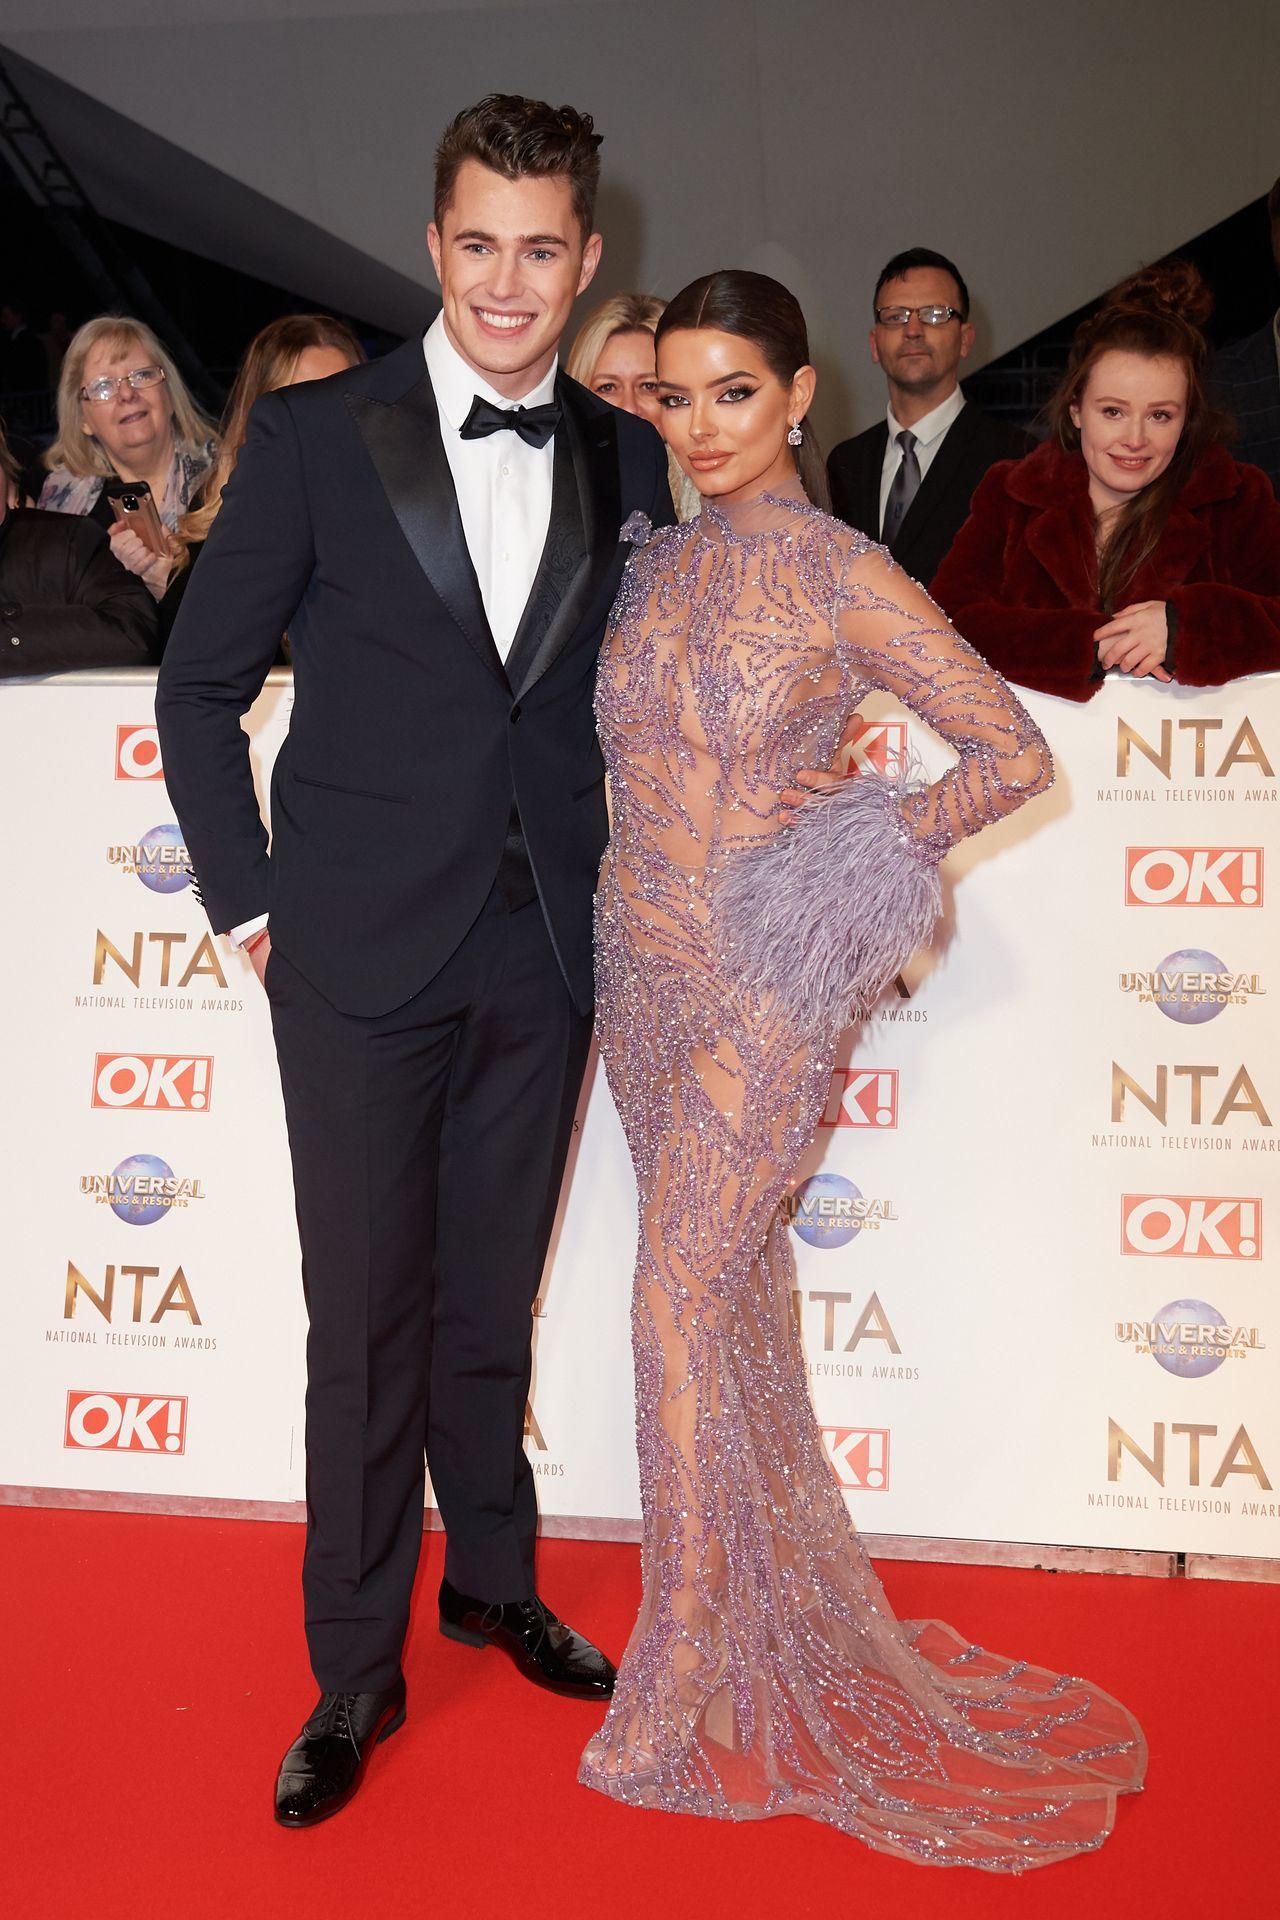 Maura Higgins Looks Hot At The National Television Awards 0009